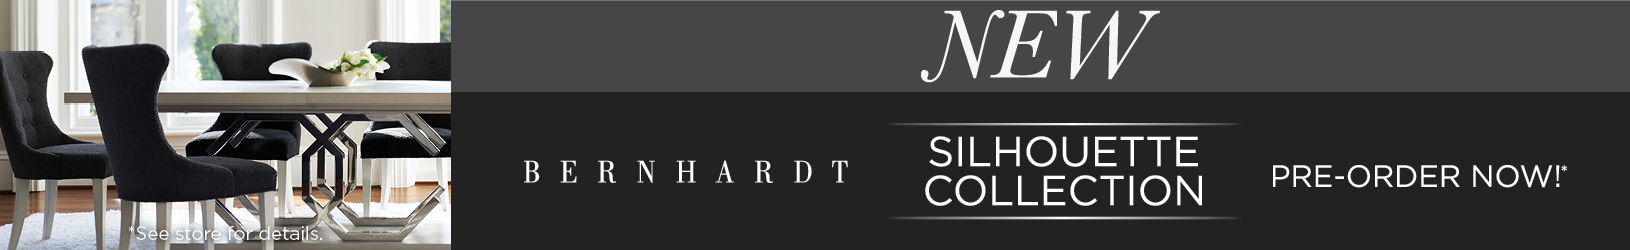 Bernhardt Silhouette Collection